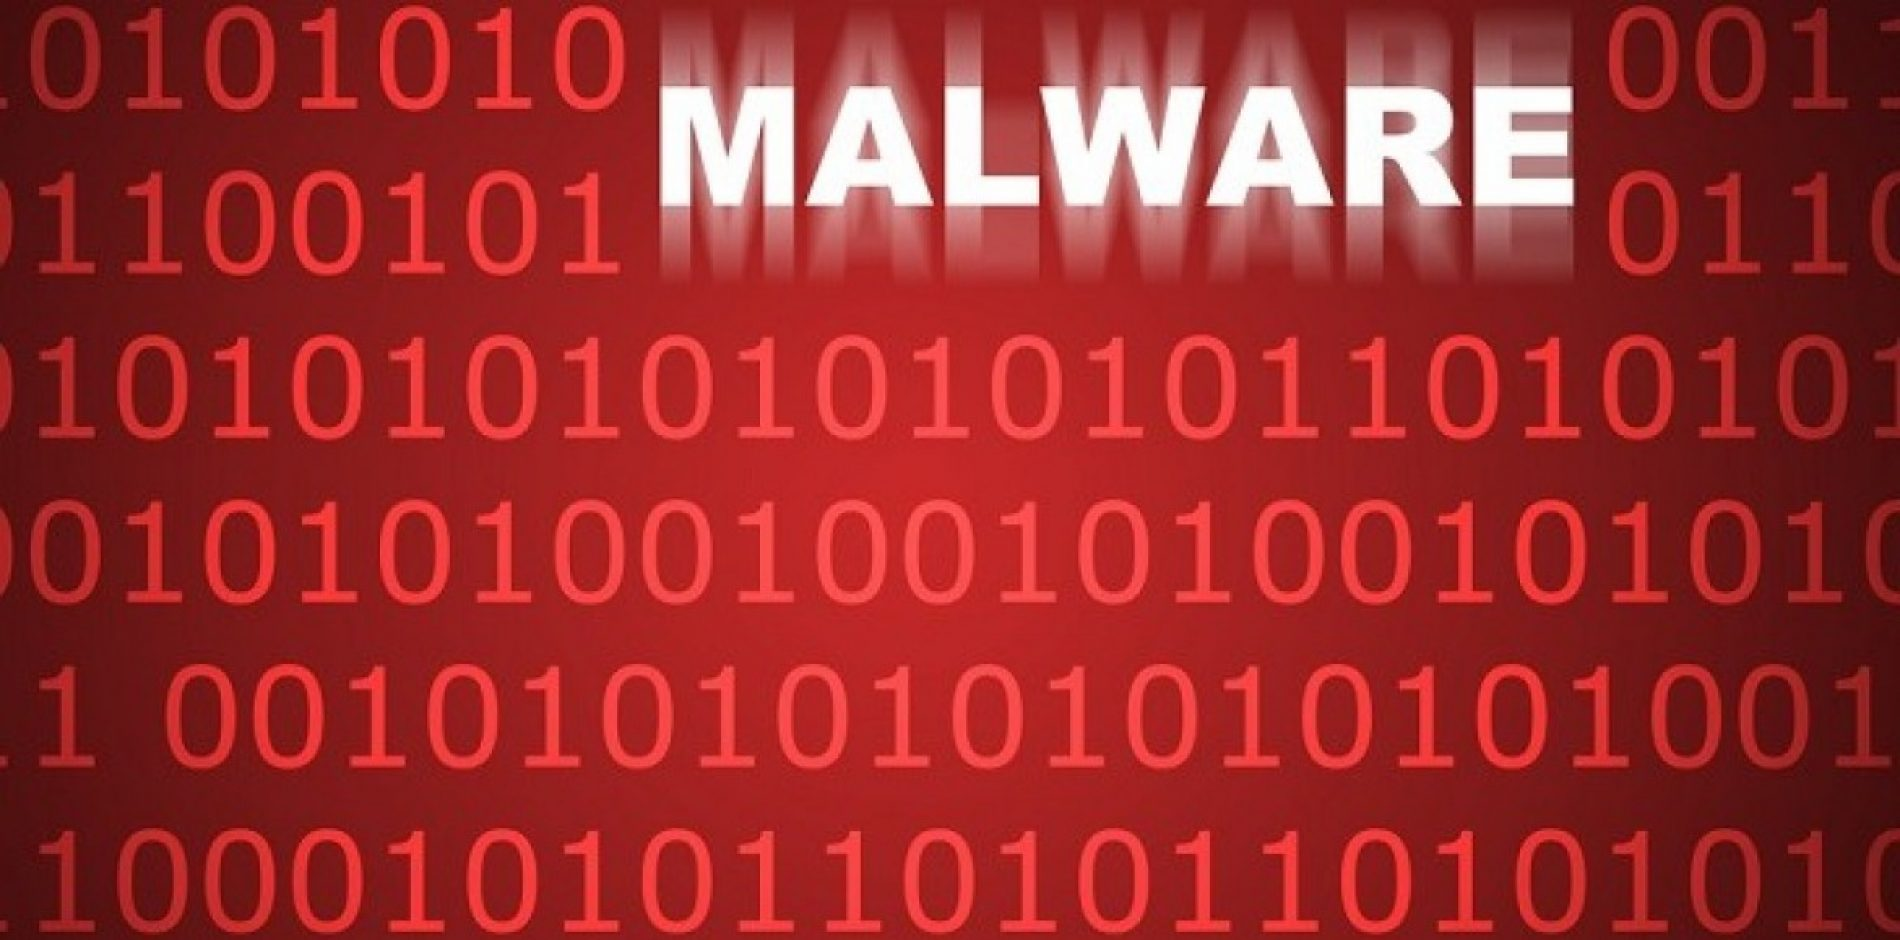 Rimuovere facilmente i malware via software